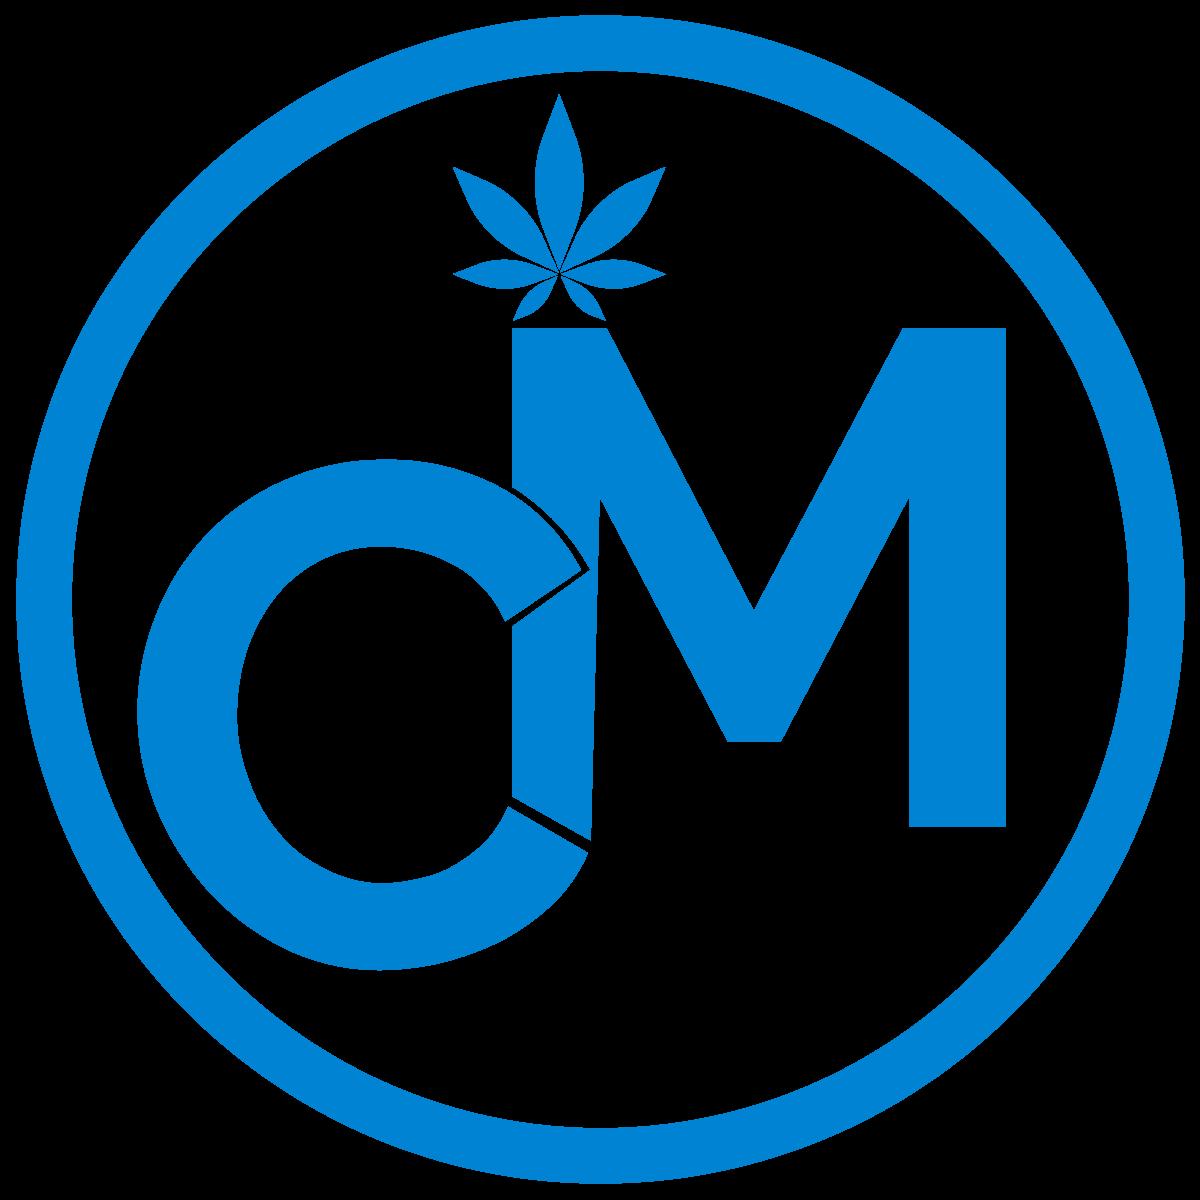 CannabisMarketCap: Cannabis Stock Market Capitalizations